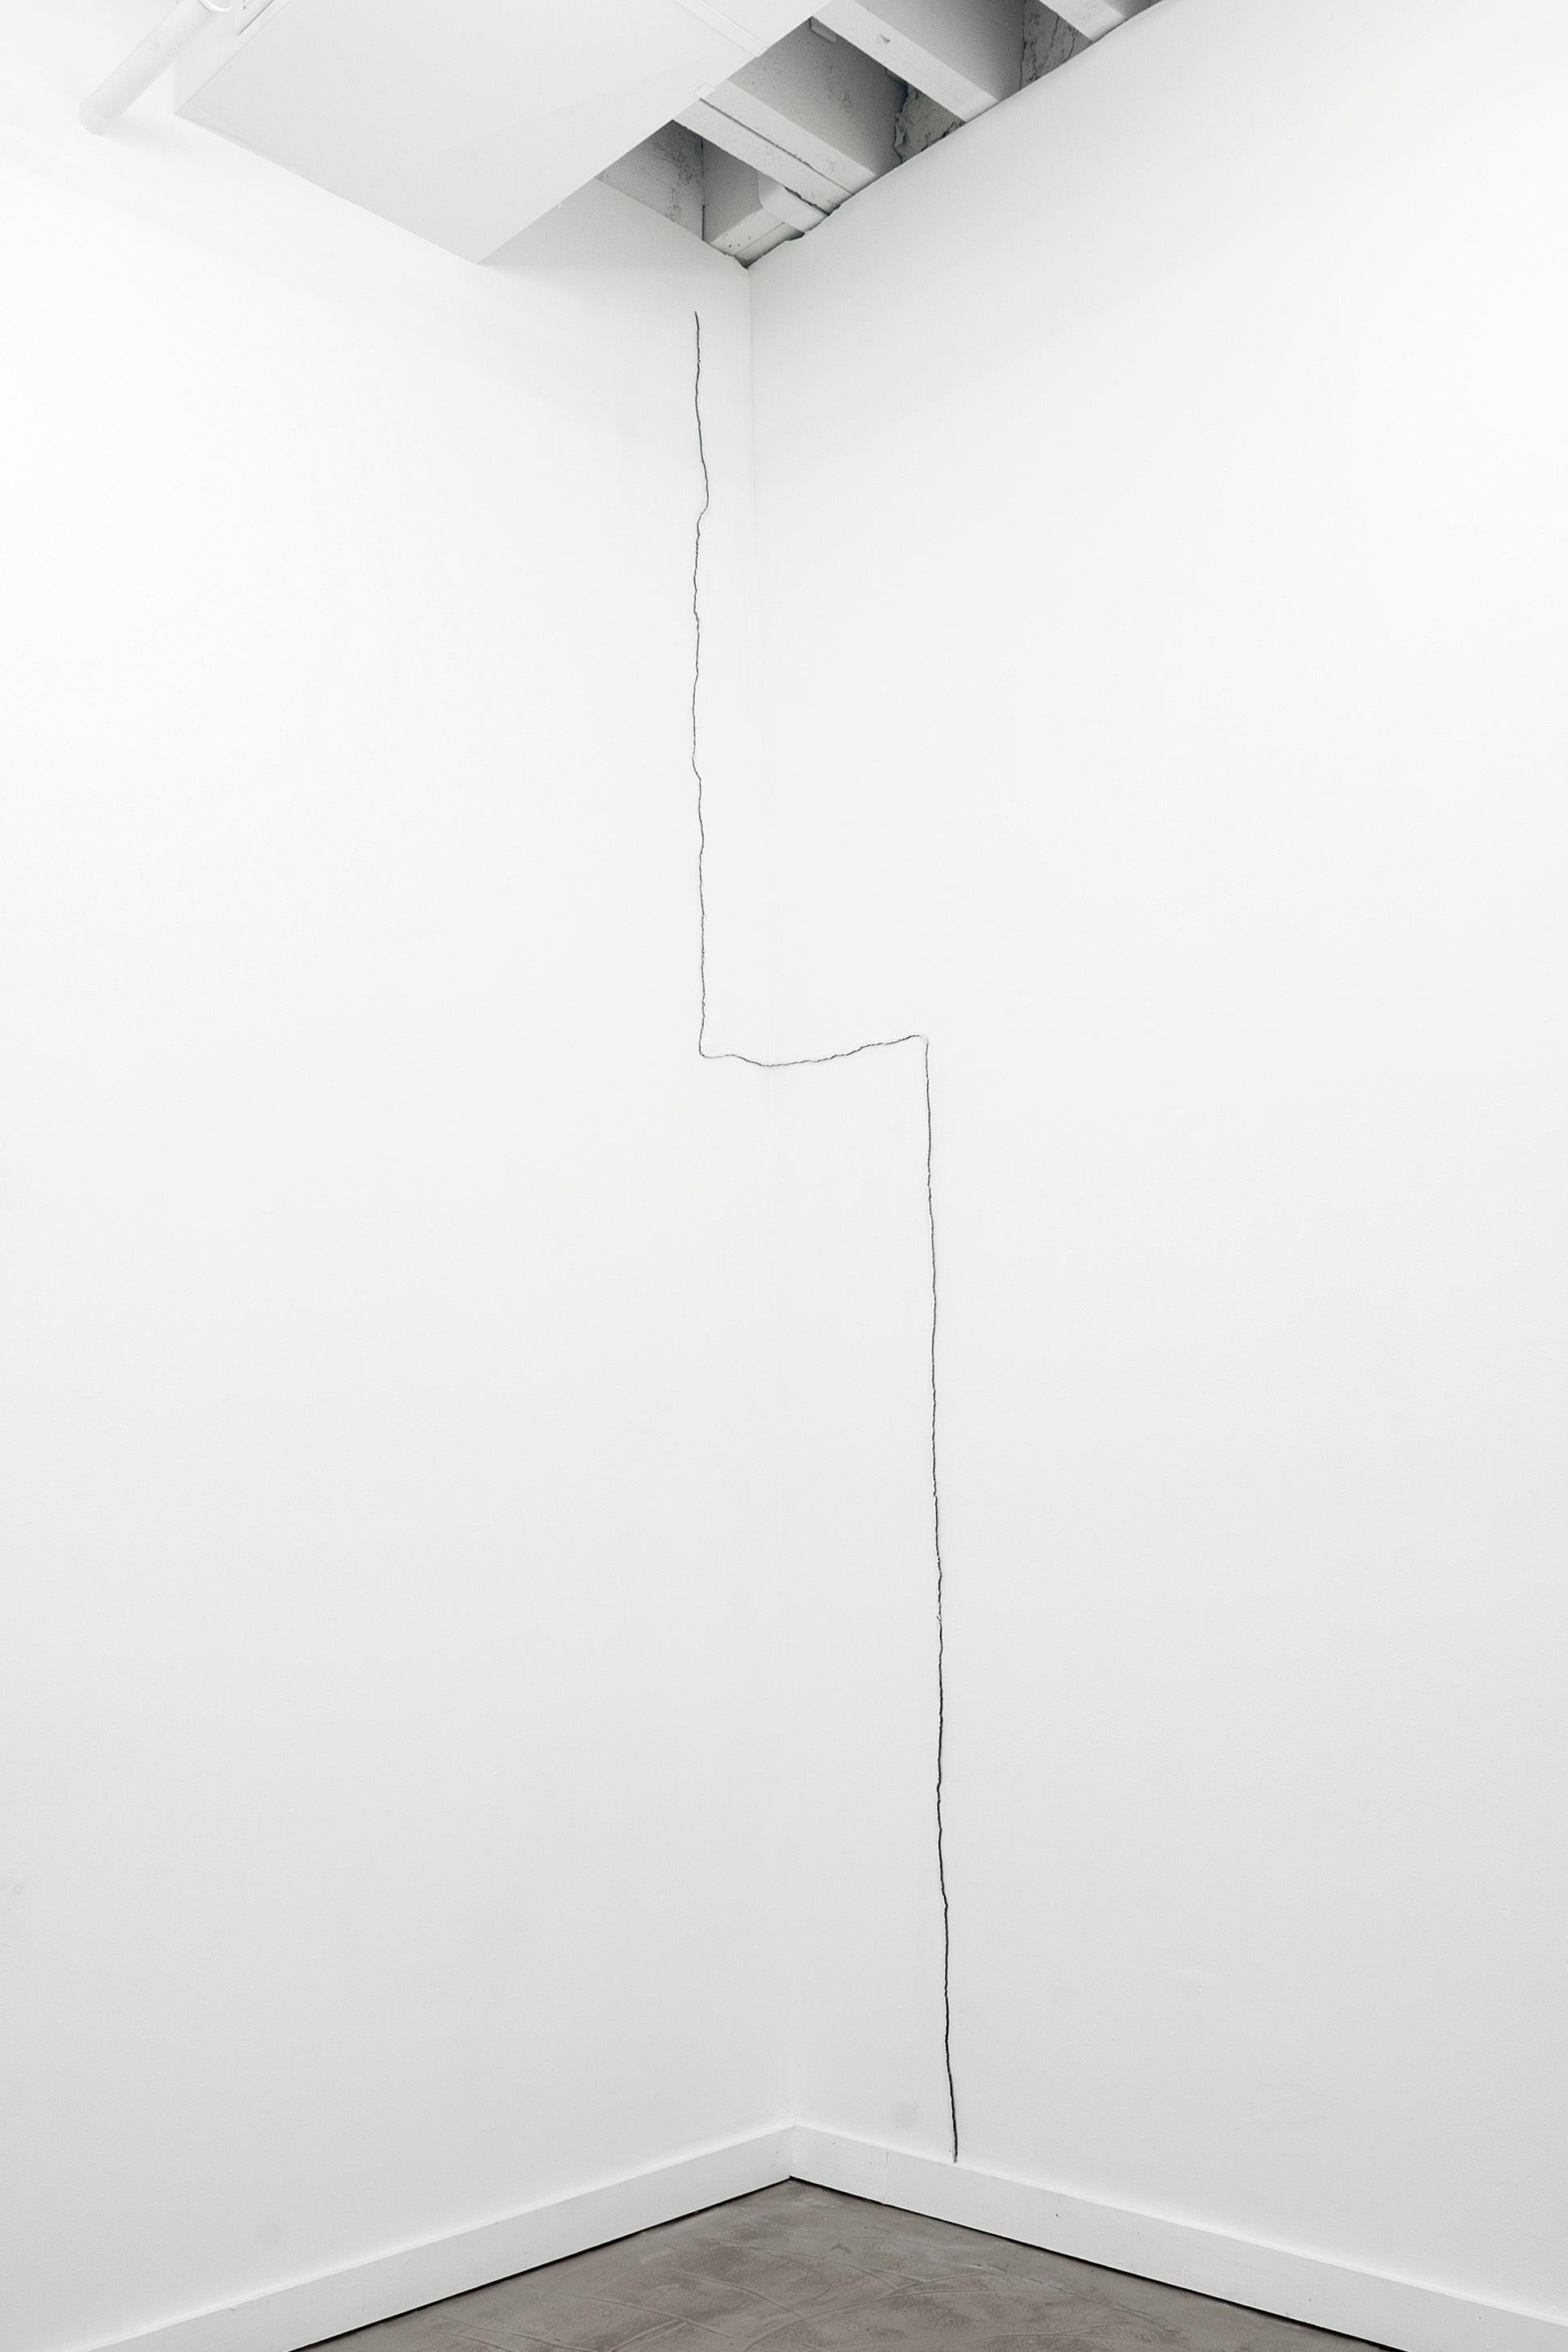 .333, 2014. Enamel on steel, 100 x 18 x 18 x .25 inches -